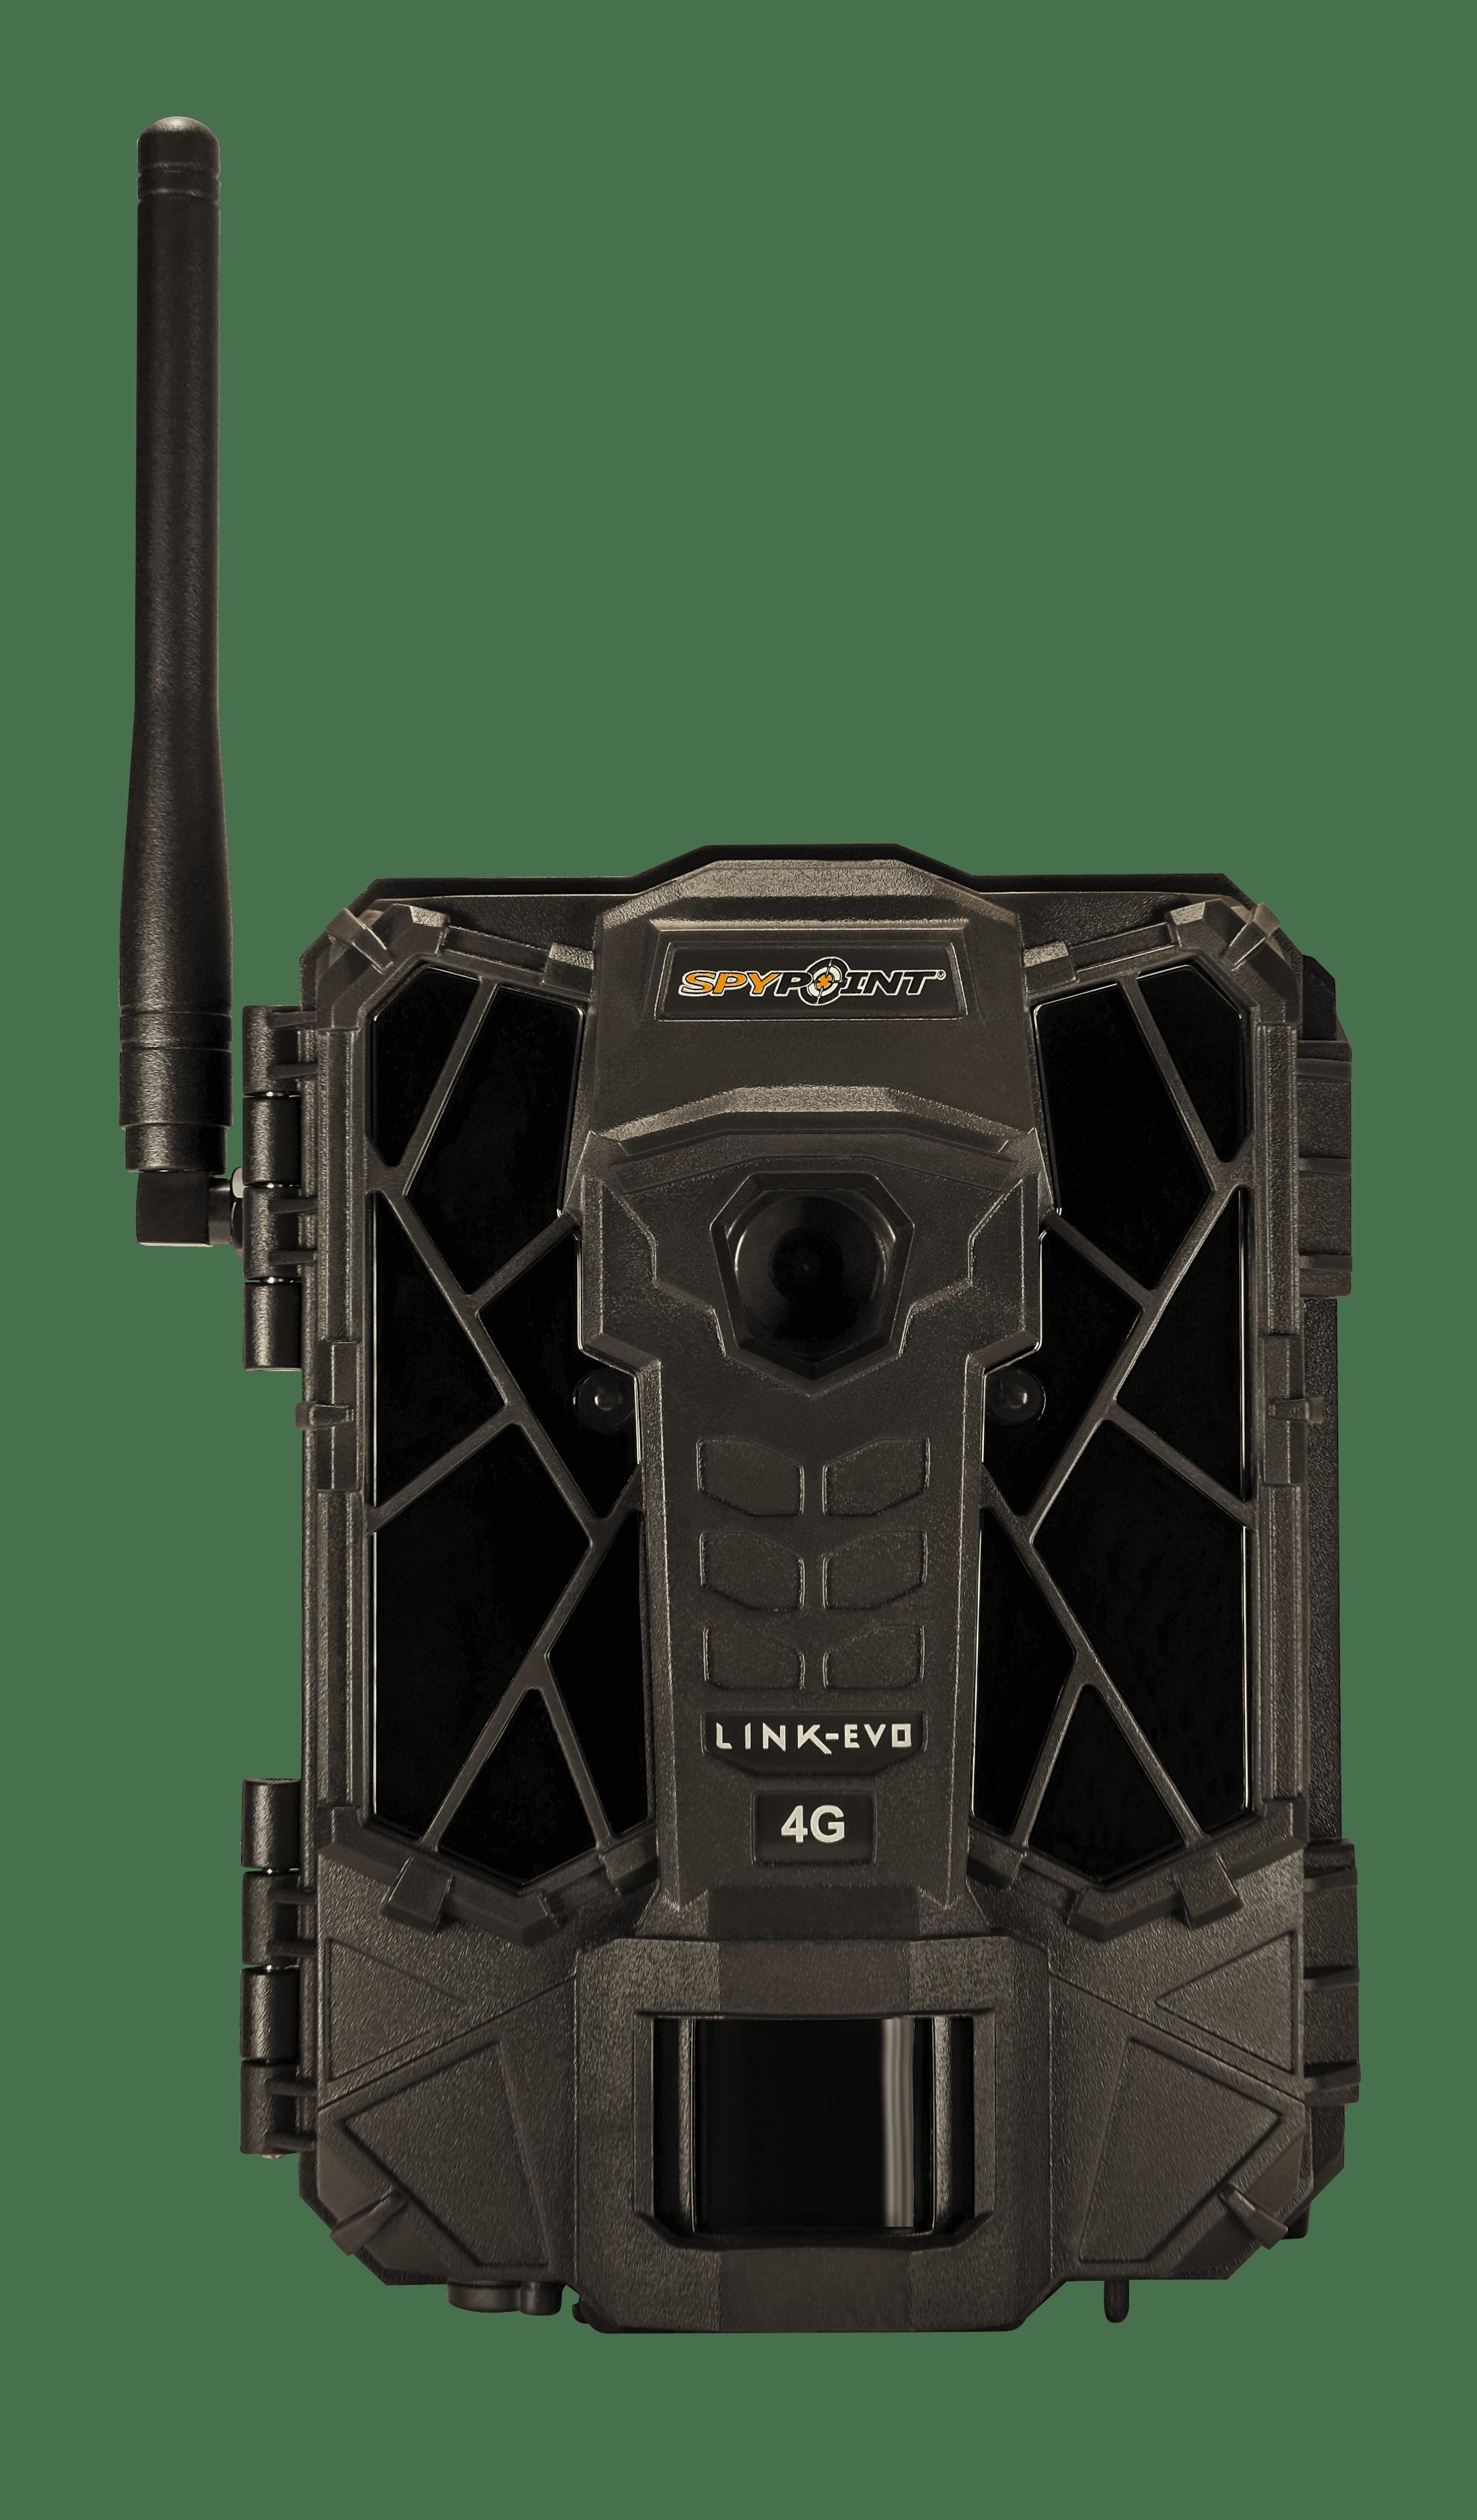 Spypoint Link Evo Nationwide Cellular Trail Camera 12 Mp Walmart Com Walmart Com